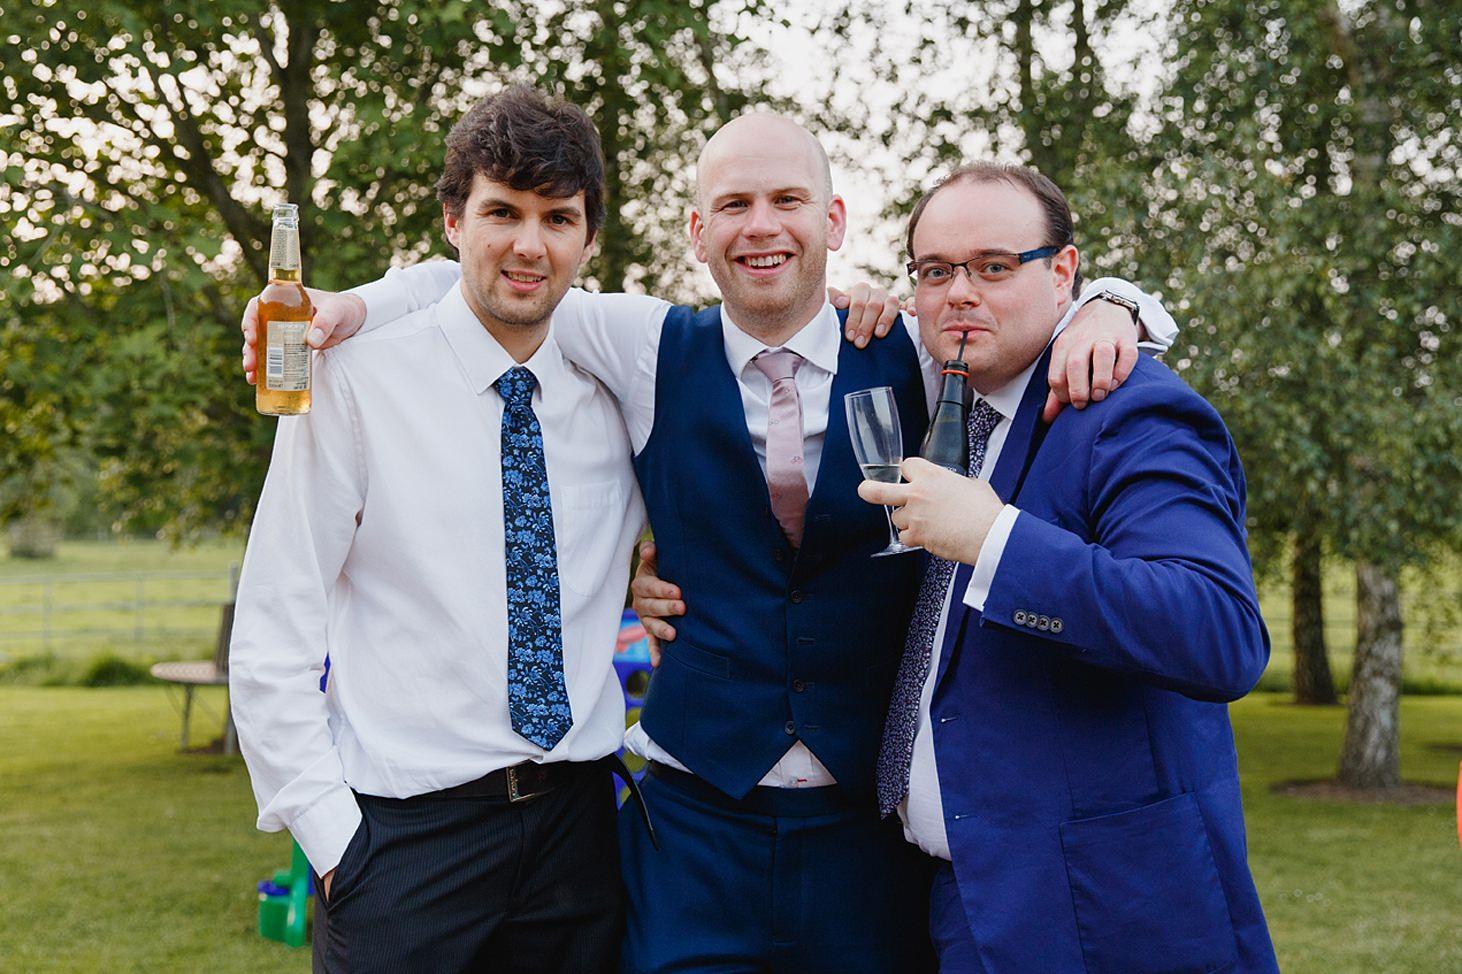 gate street barn wedding photography wedding guests at reception